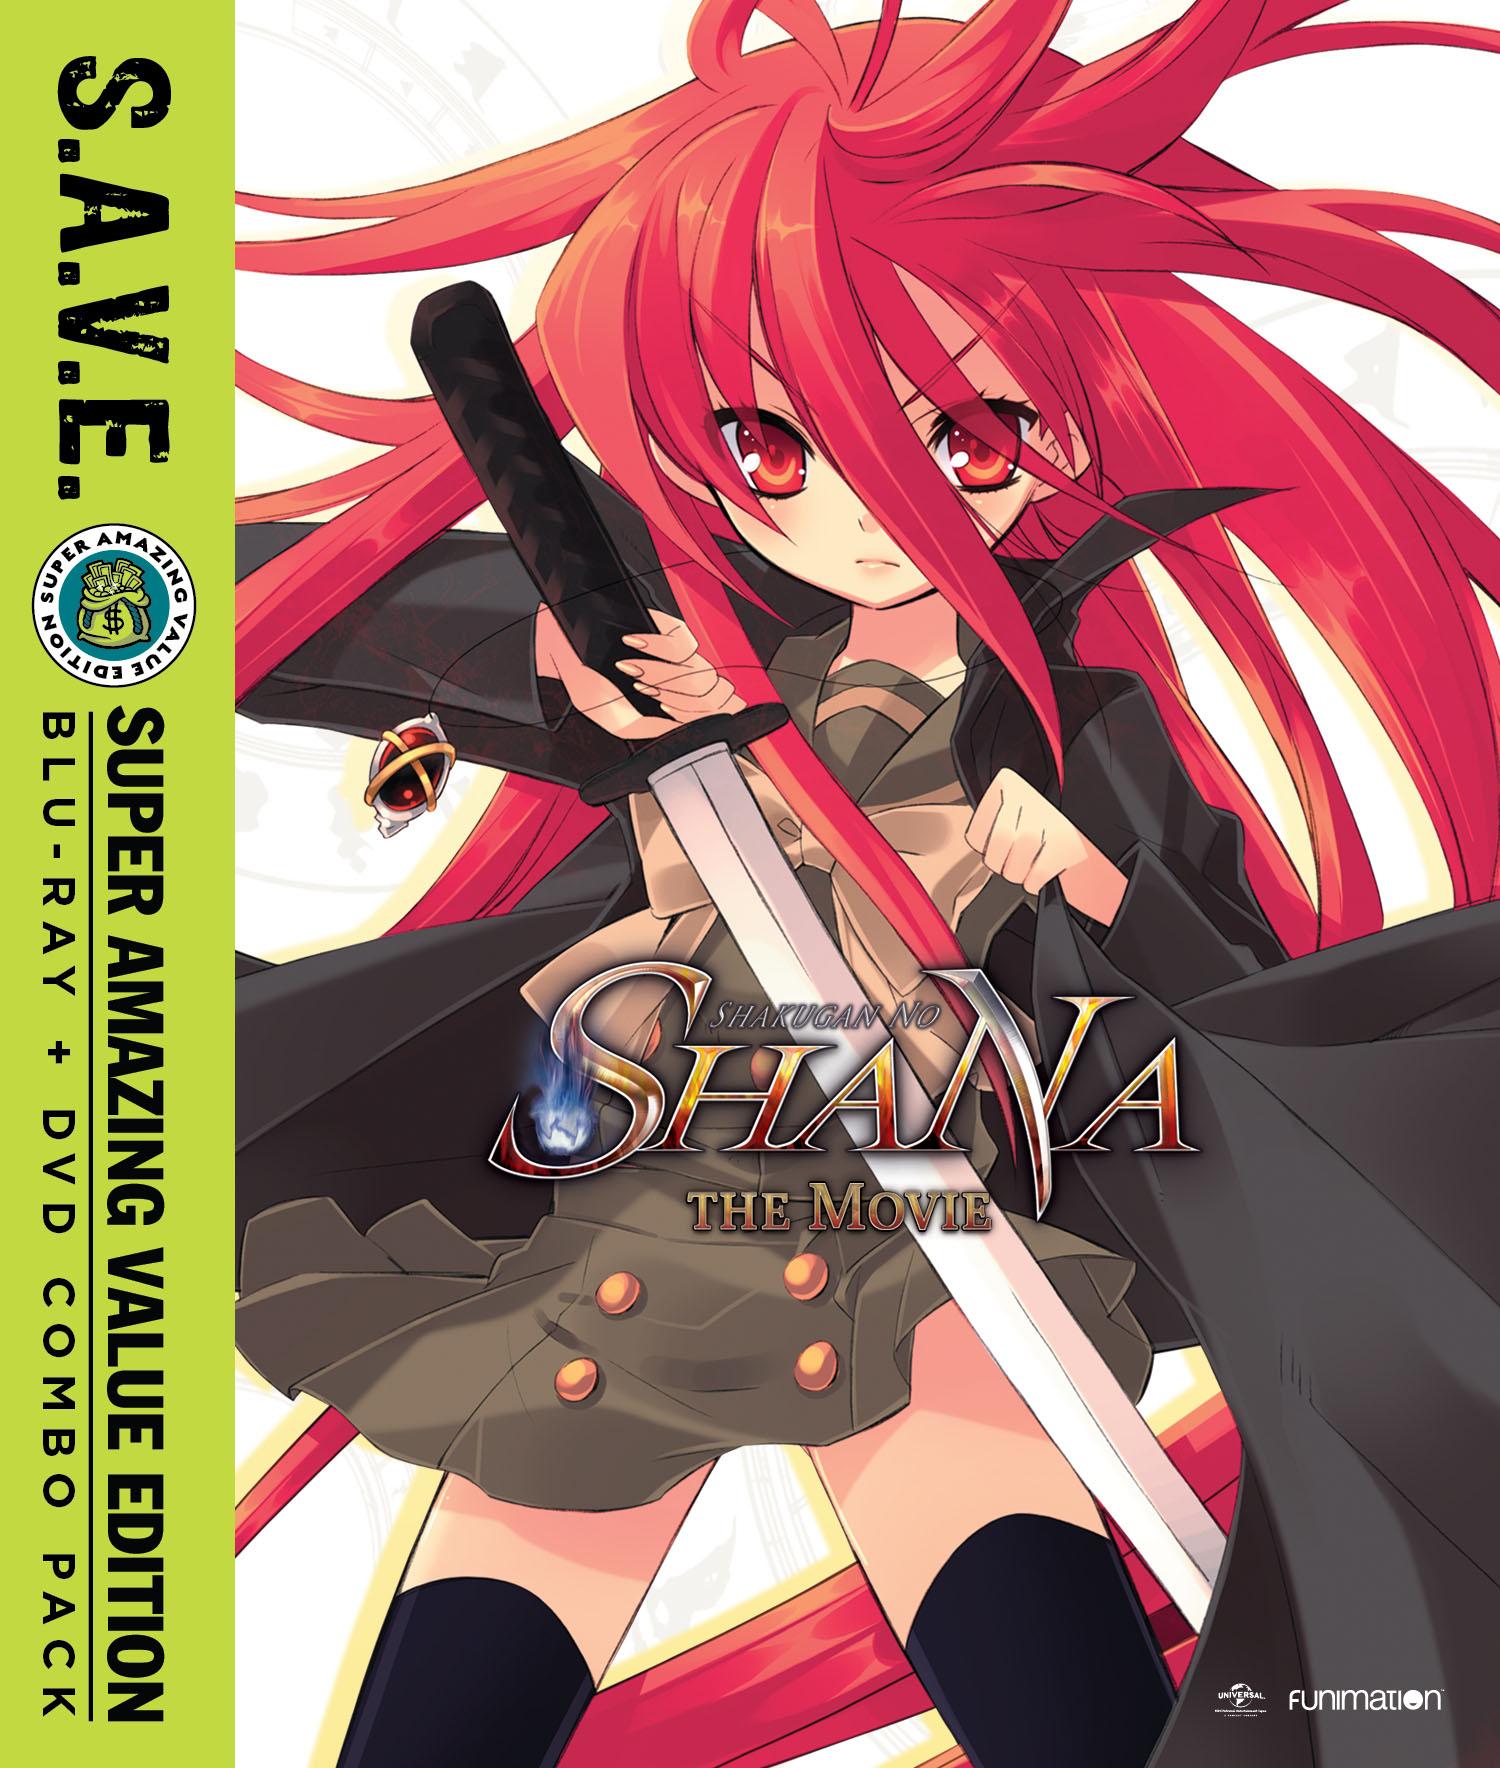 Shakugan no Shana The Movie Blu-ray/DVD SAVE Edition